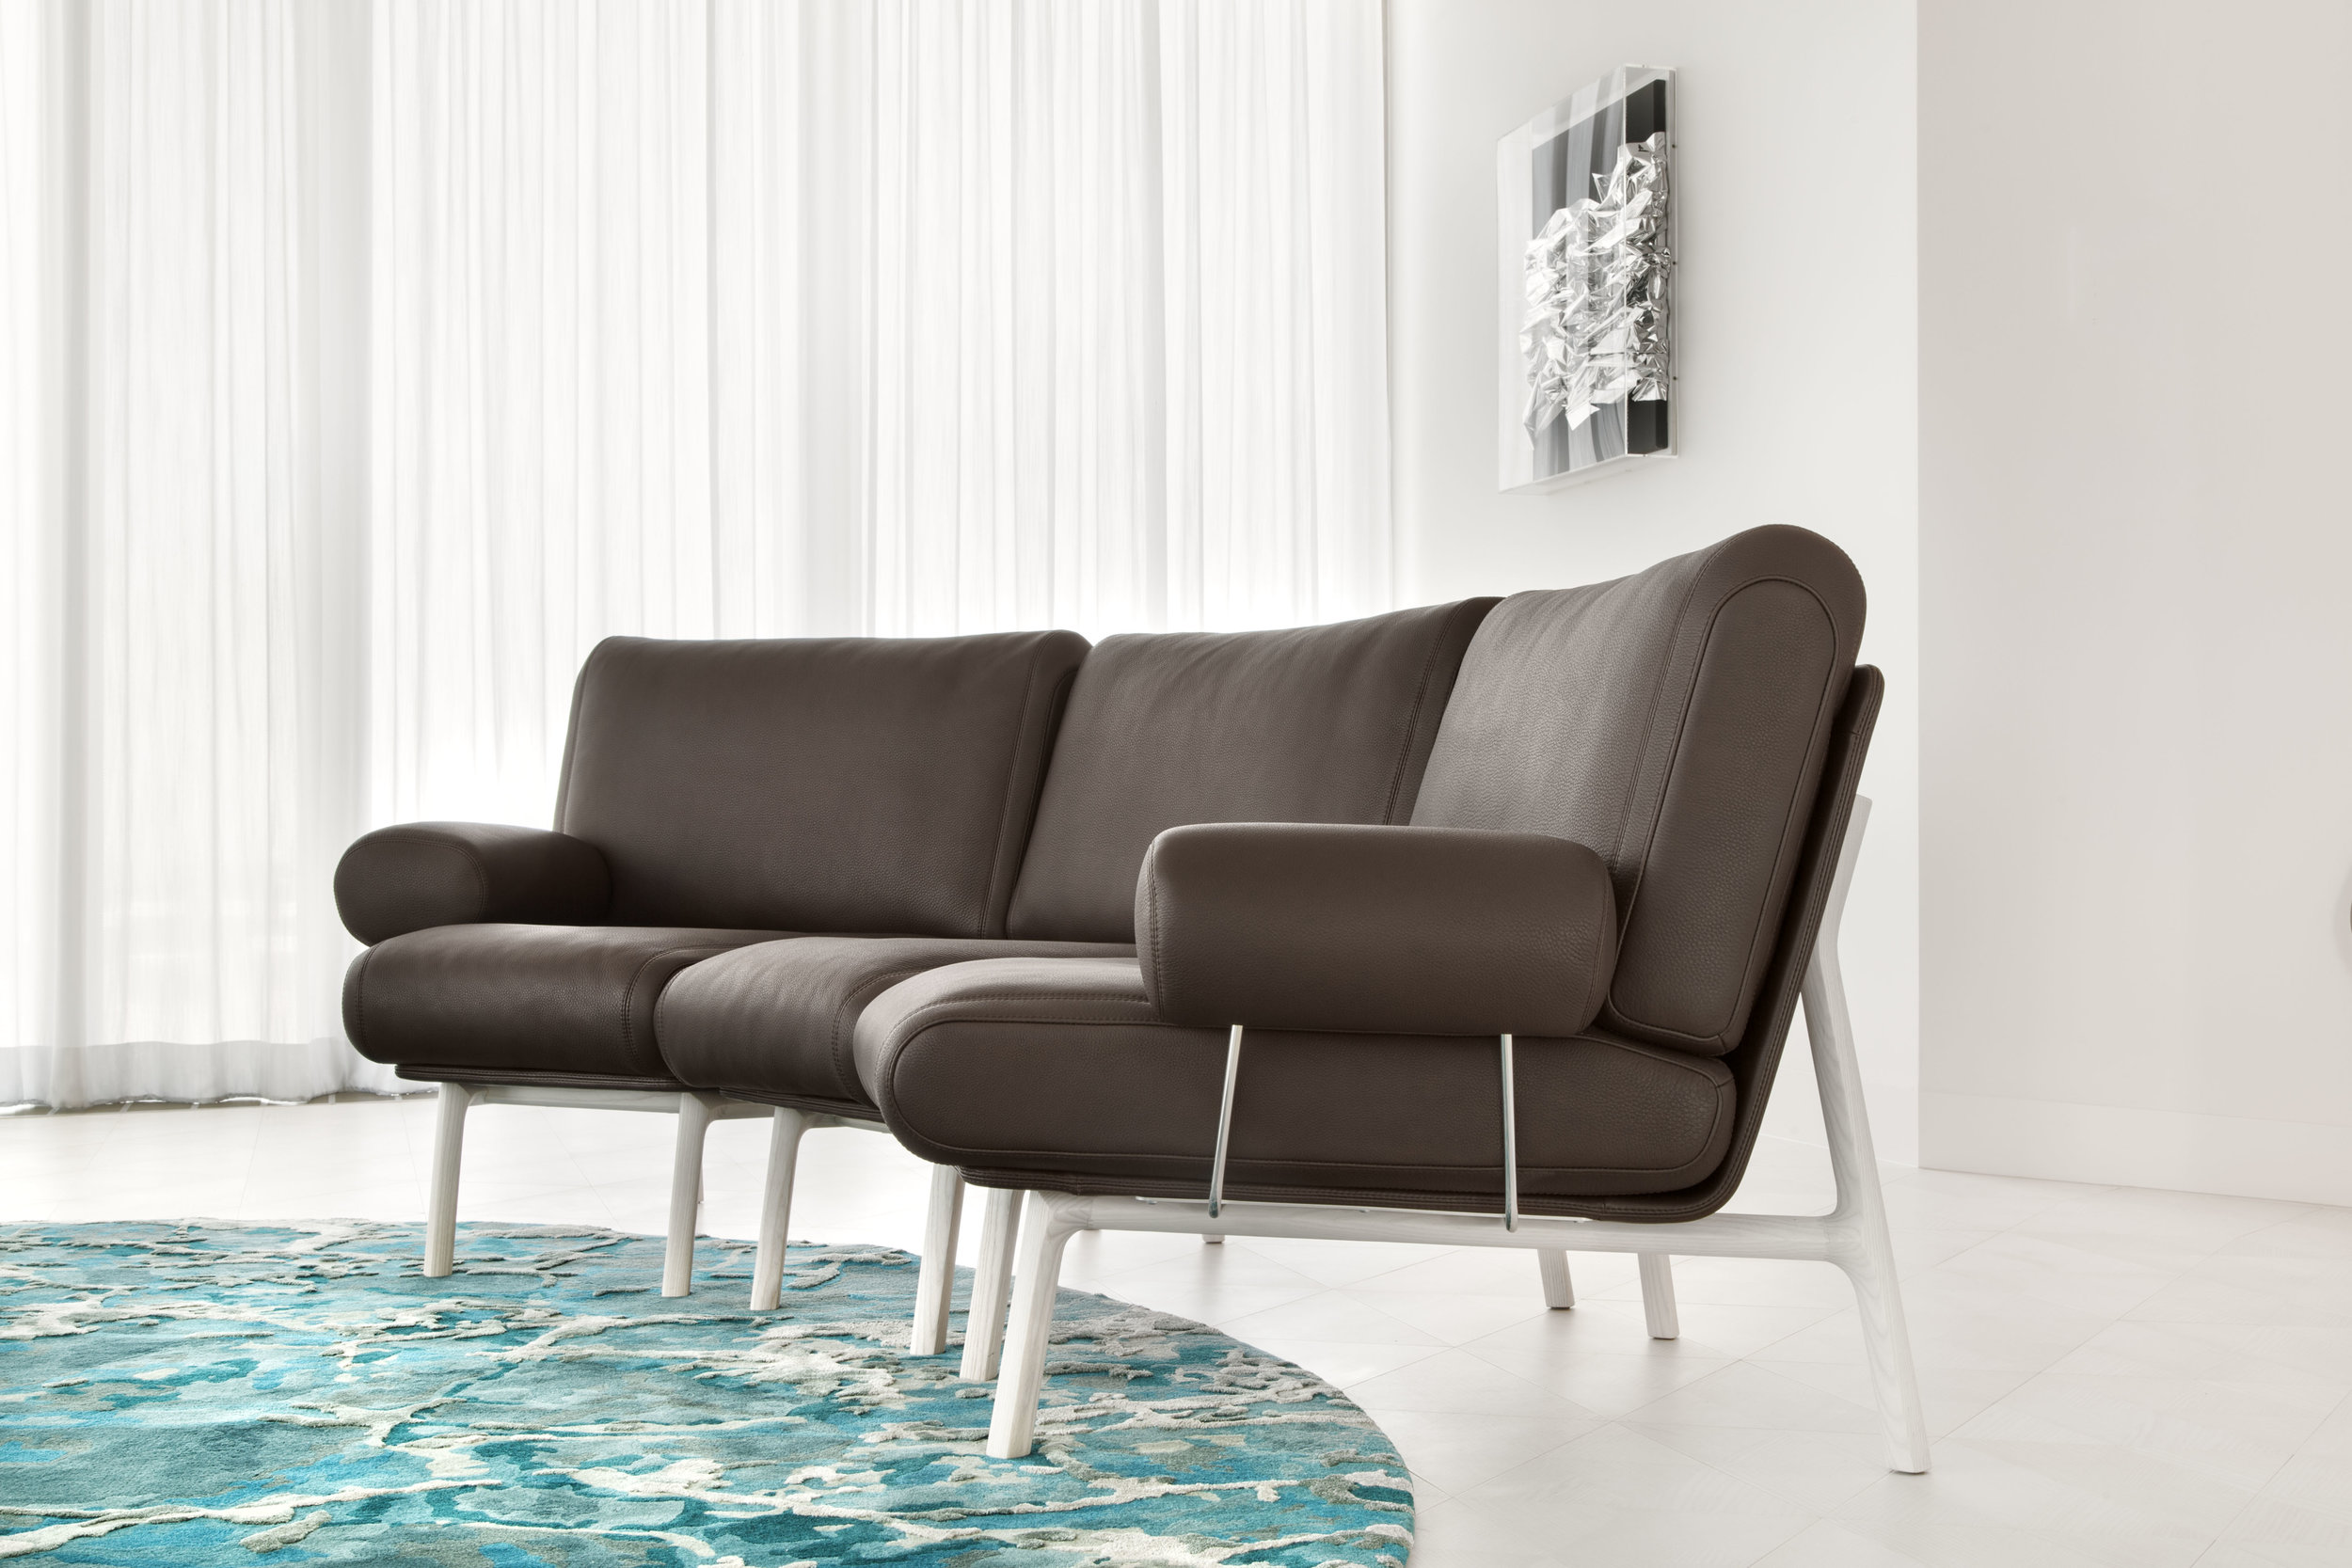 medeo-sofa_furniture-design_coordination-berlin_02.jpg